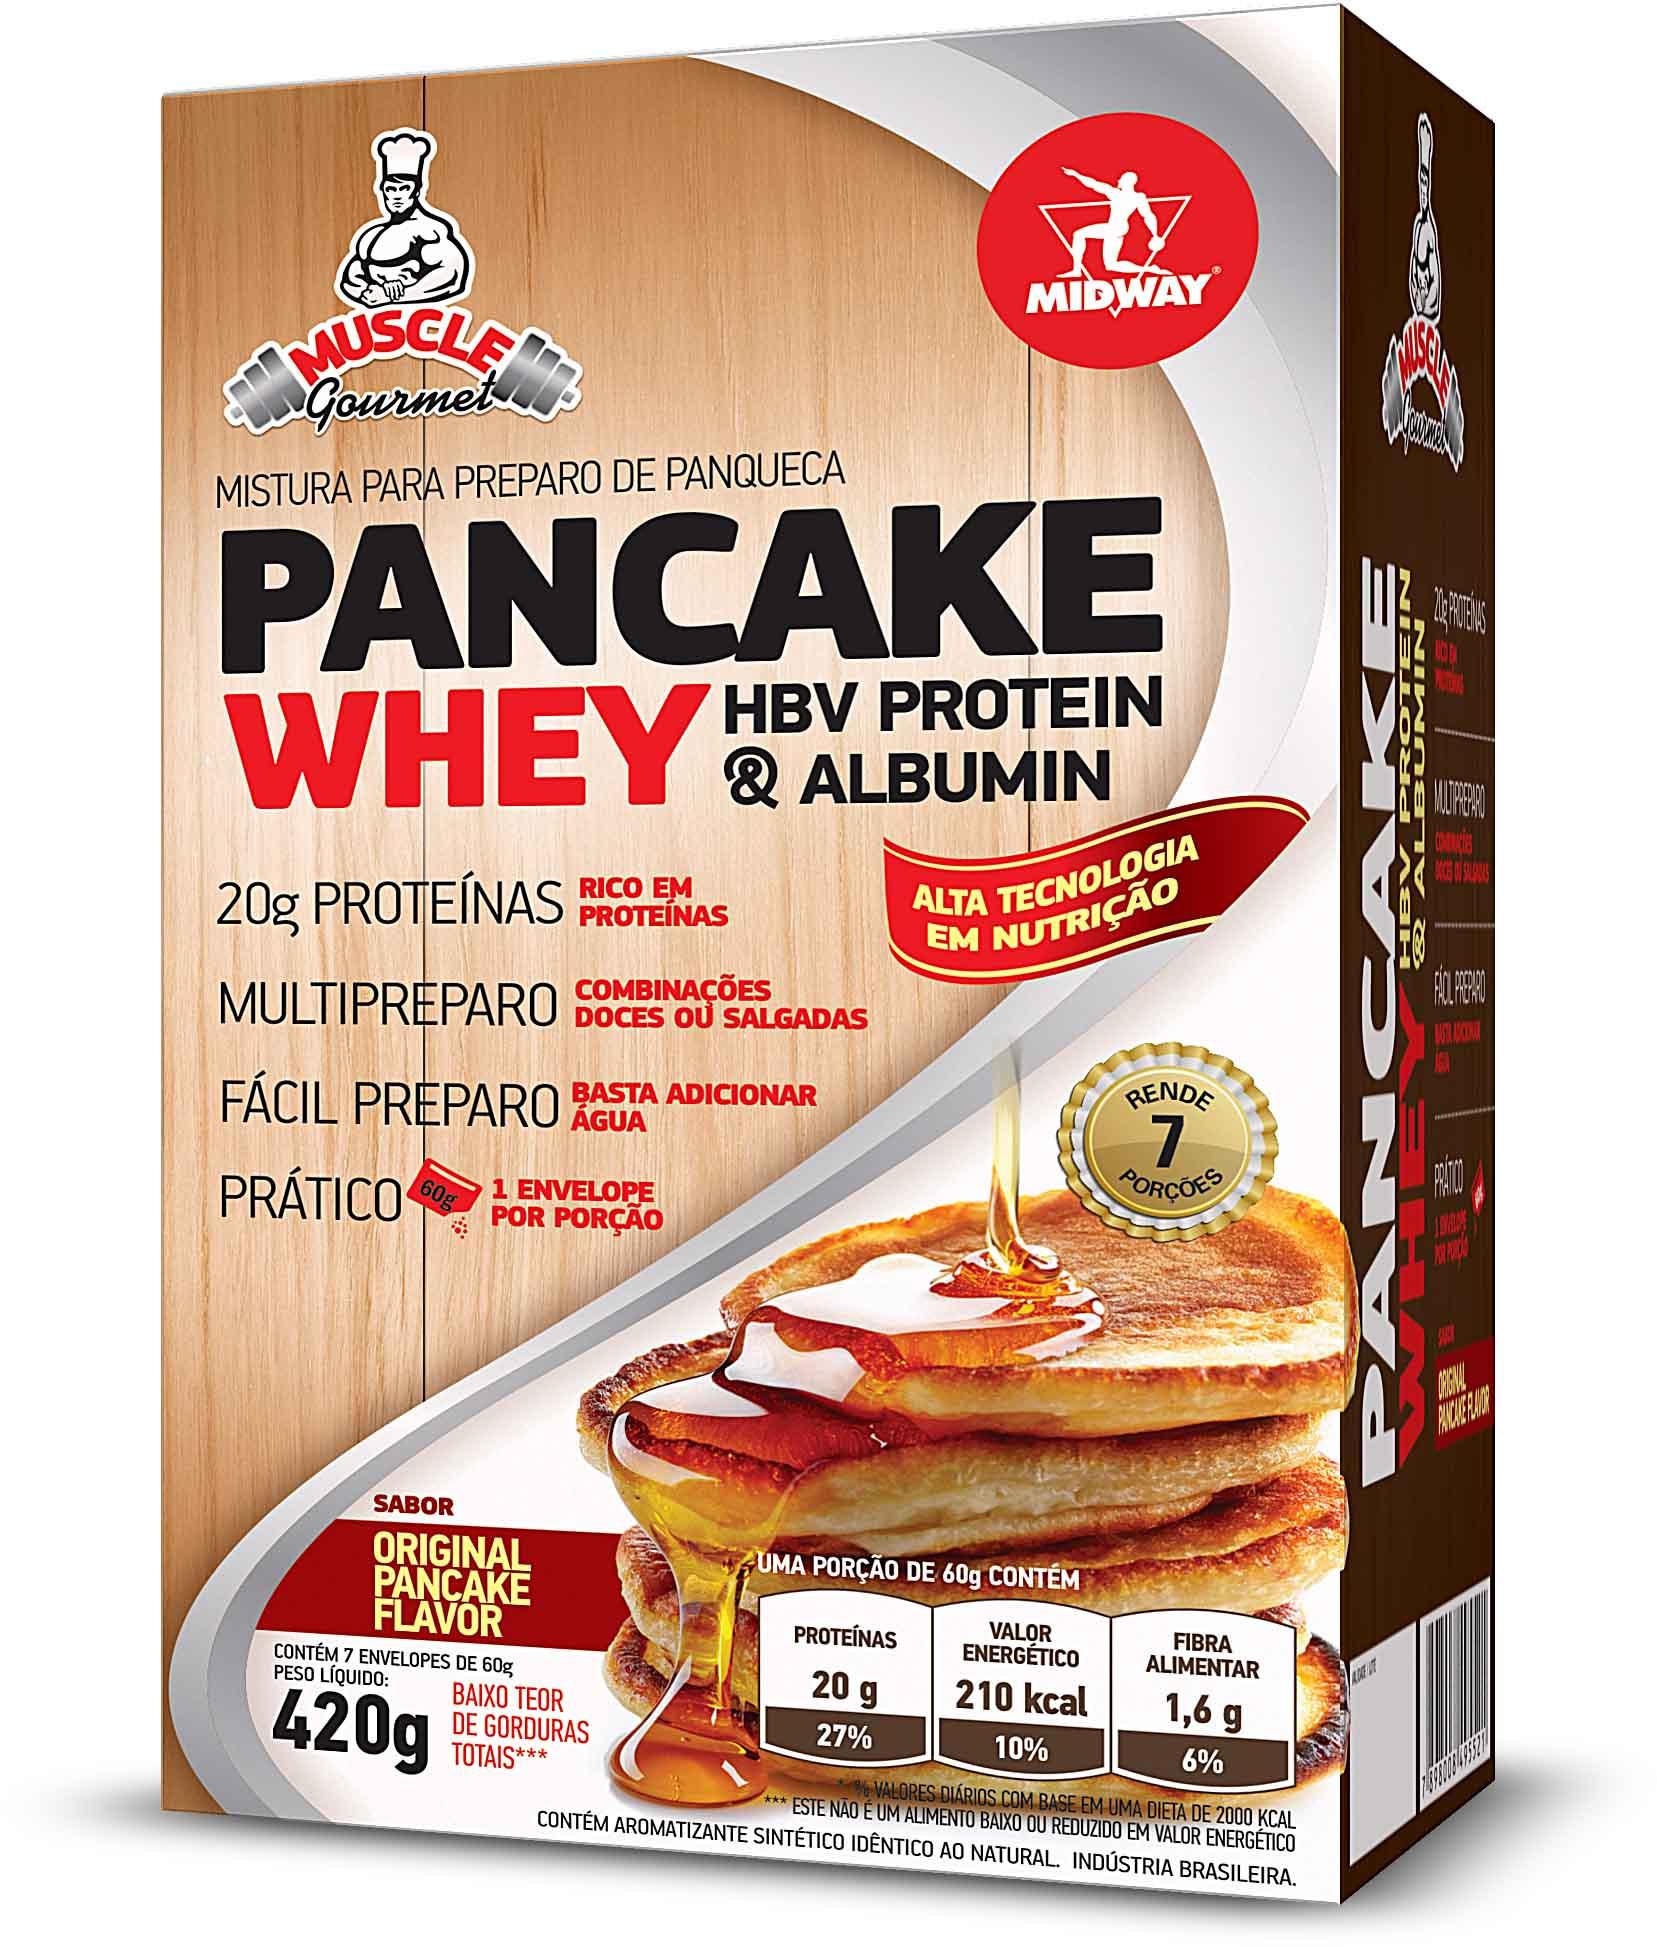 Calda de Chocolate Syrup Genuine 680g Hershey's  + Pancake Midway